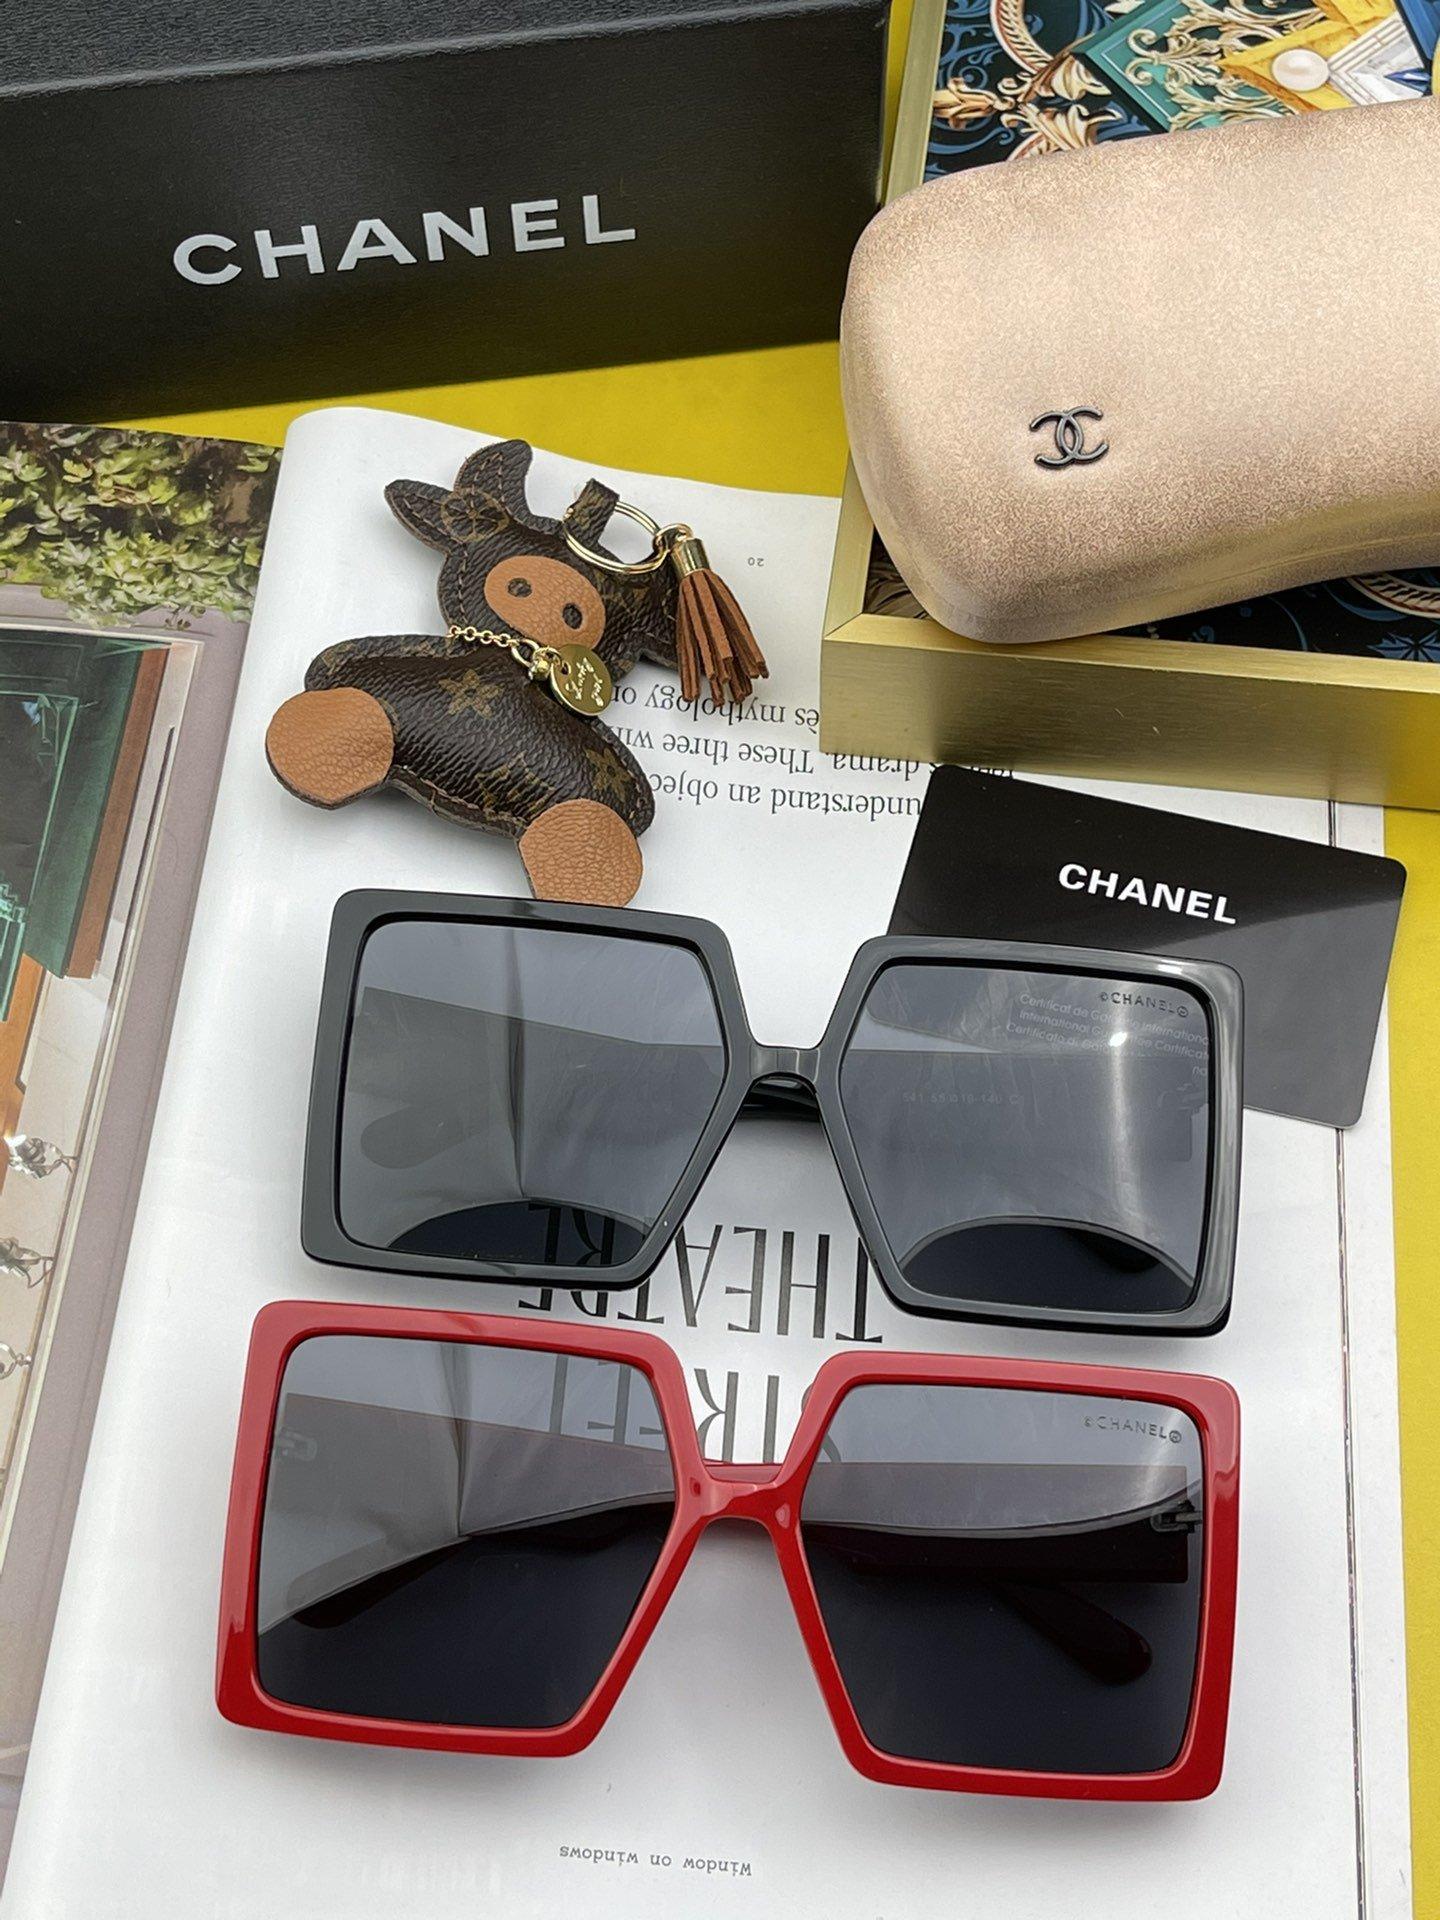 TR偏光系列Chanel大框太阳镜墨